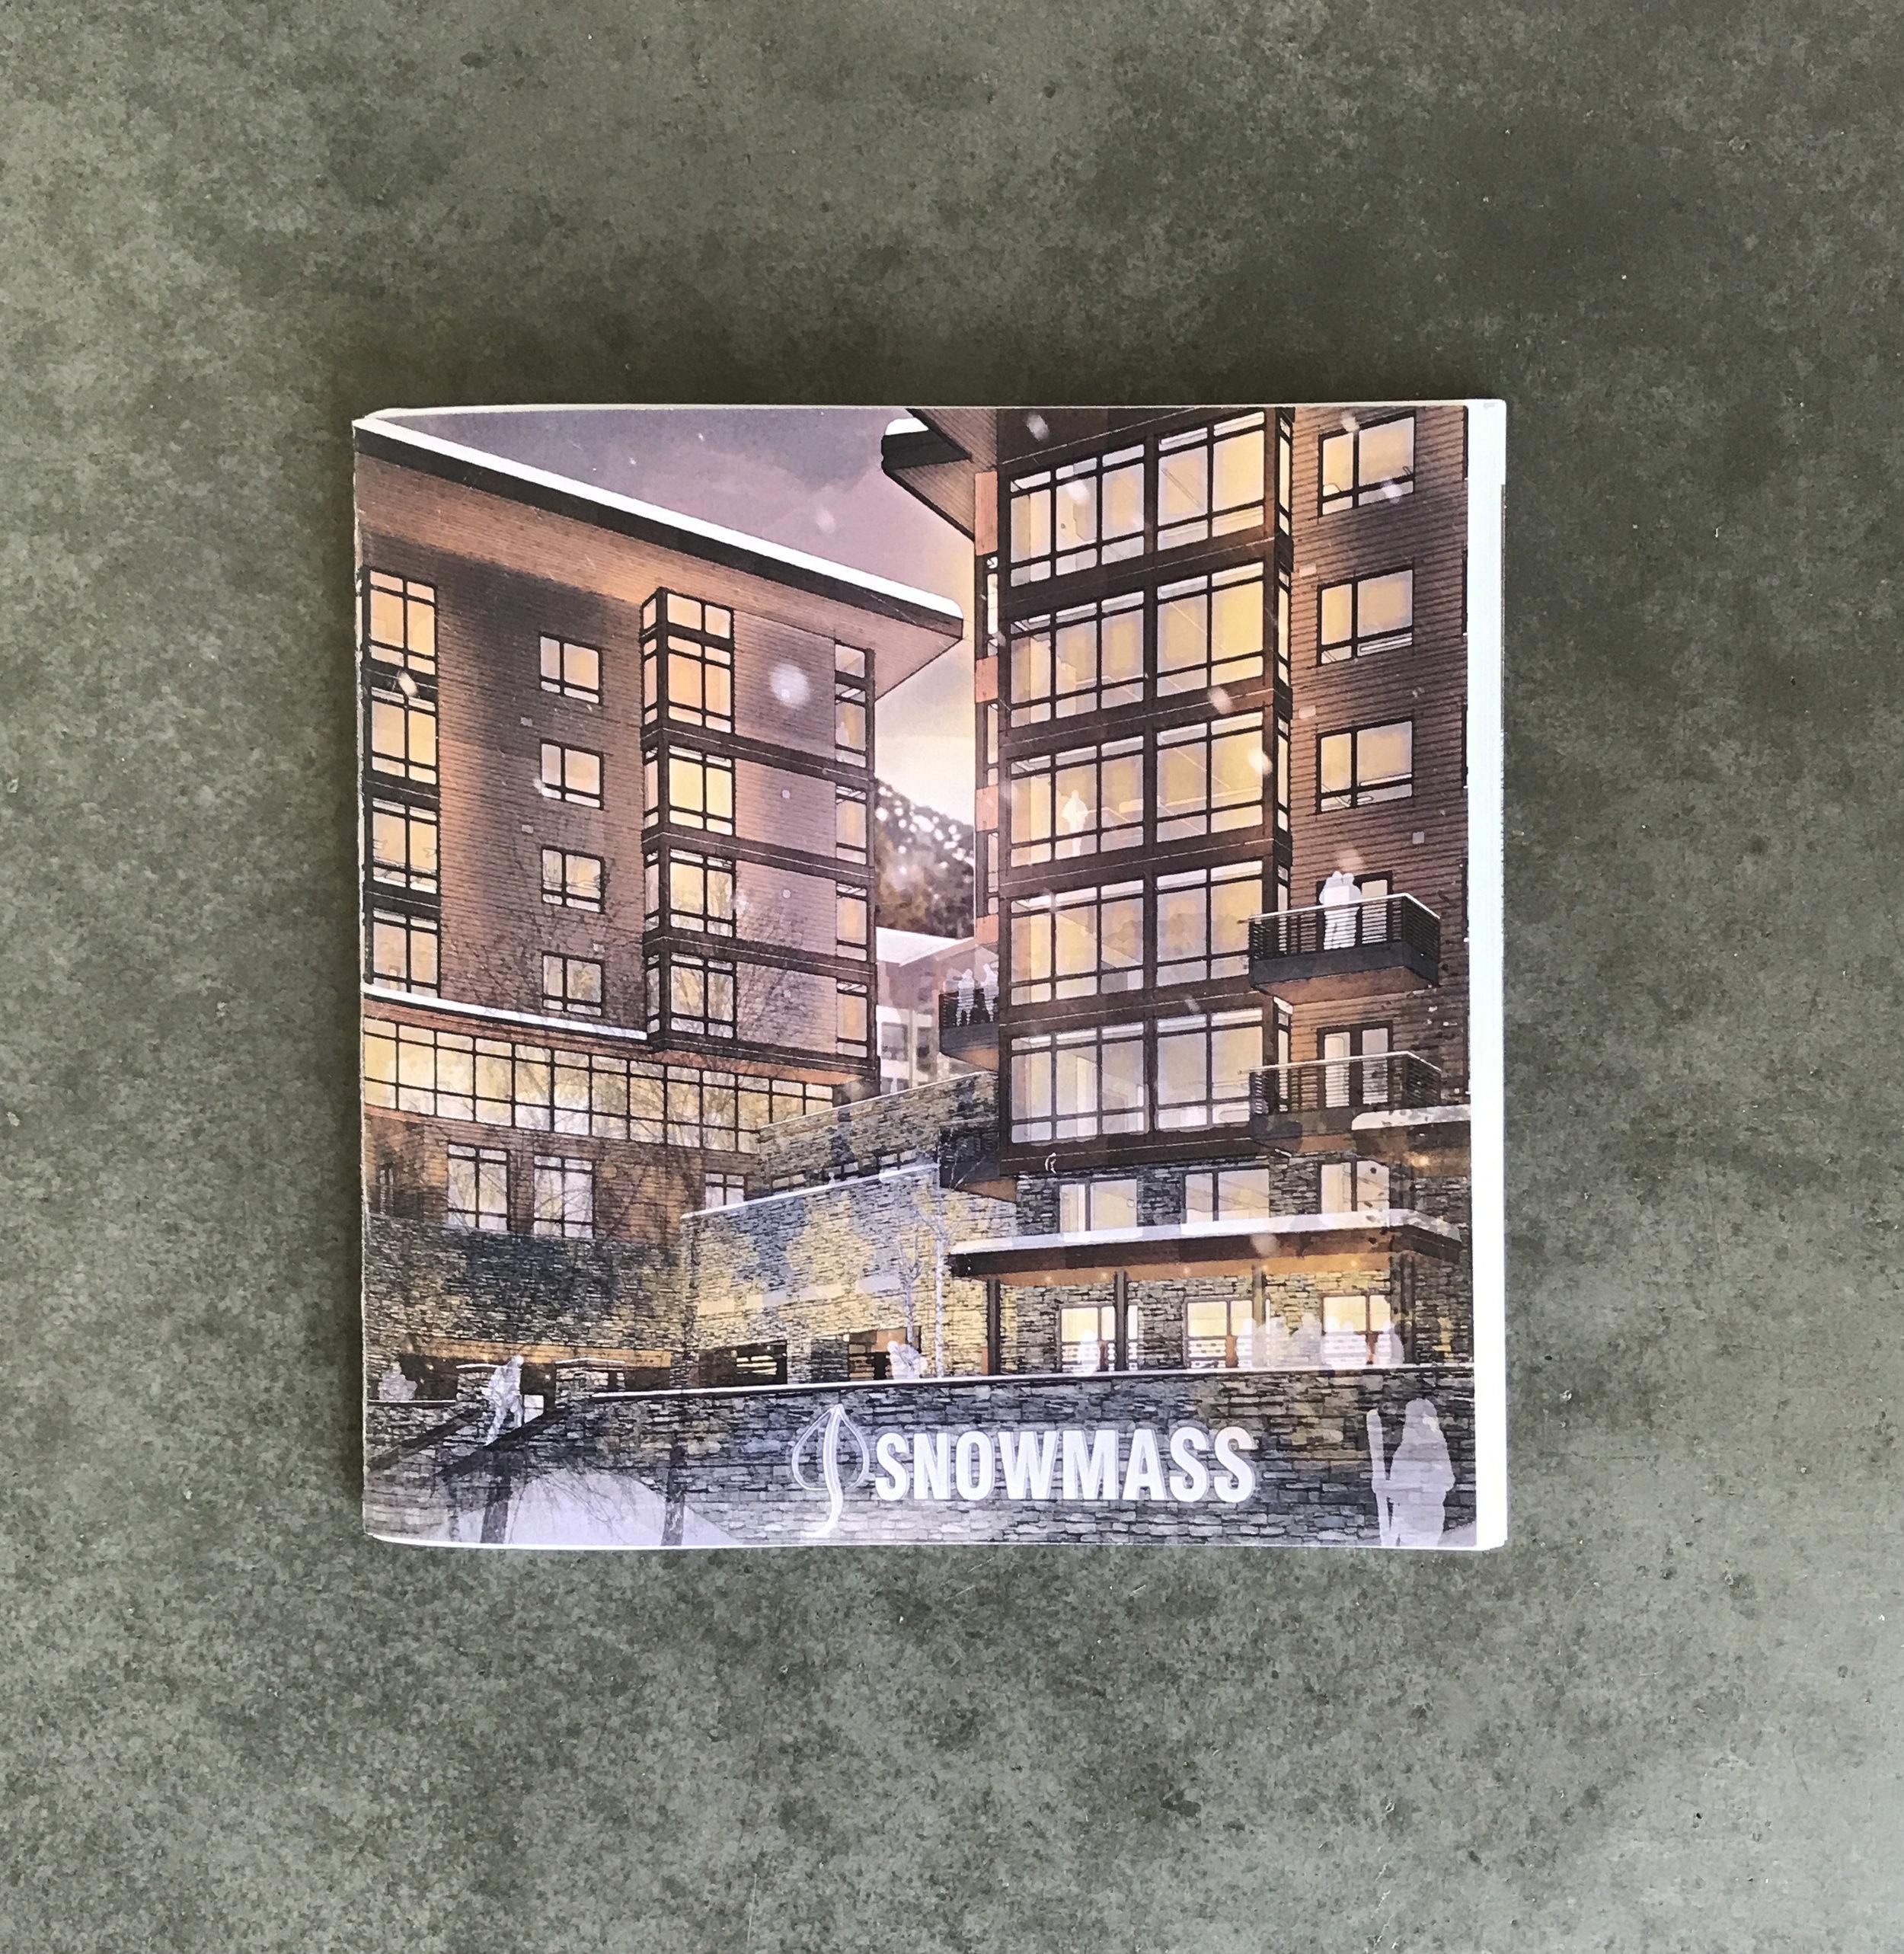 Snowmass  39˚ N - 106˚ W